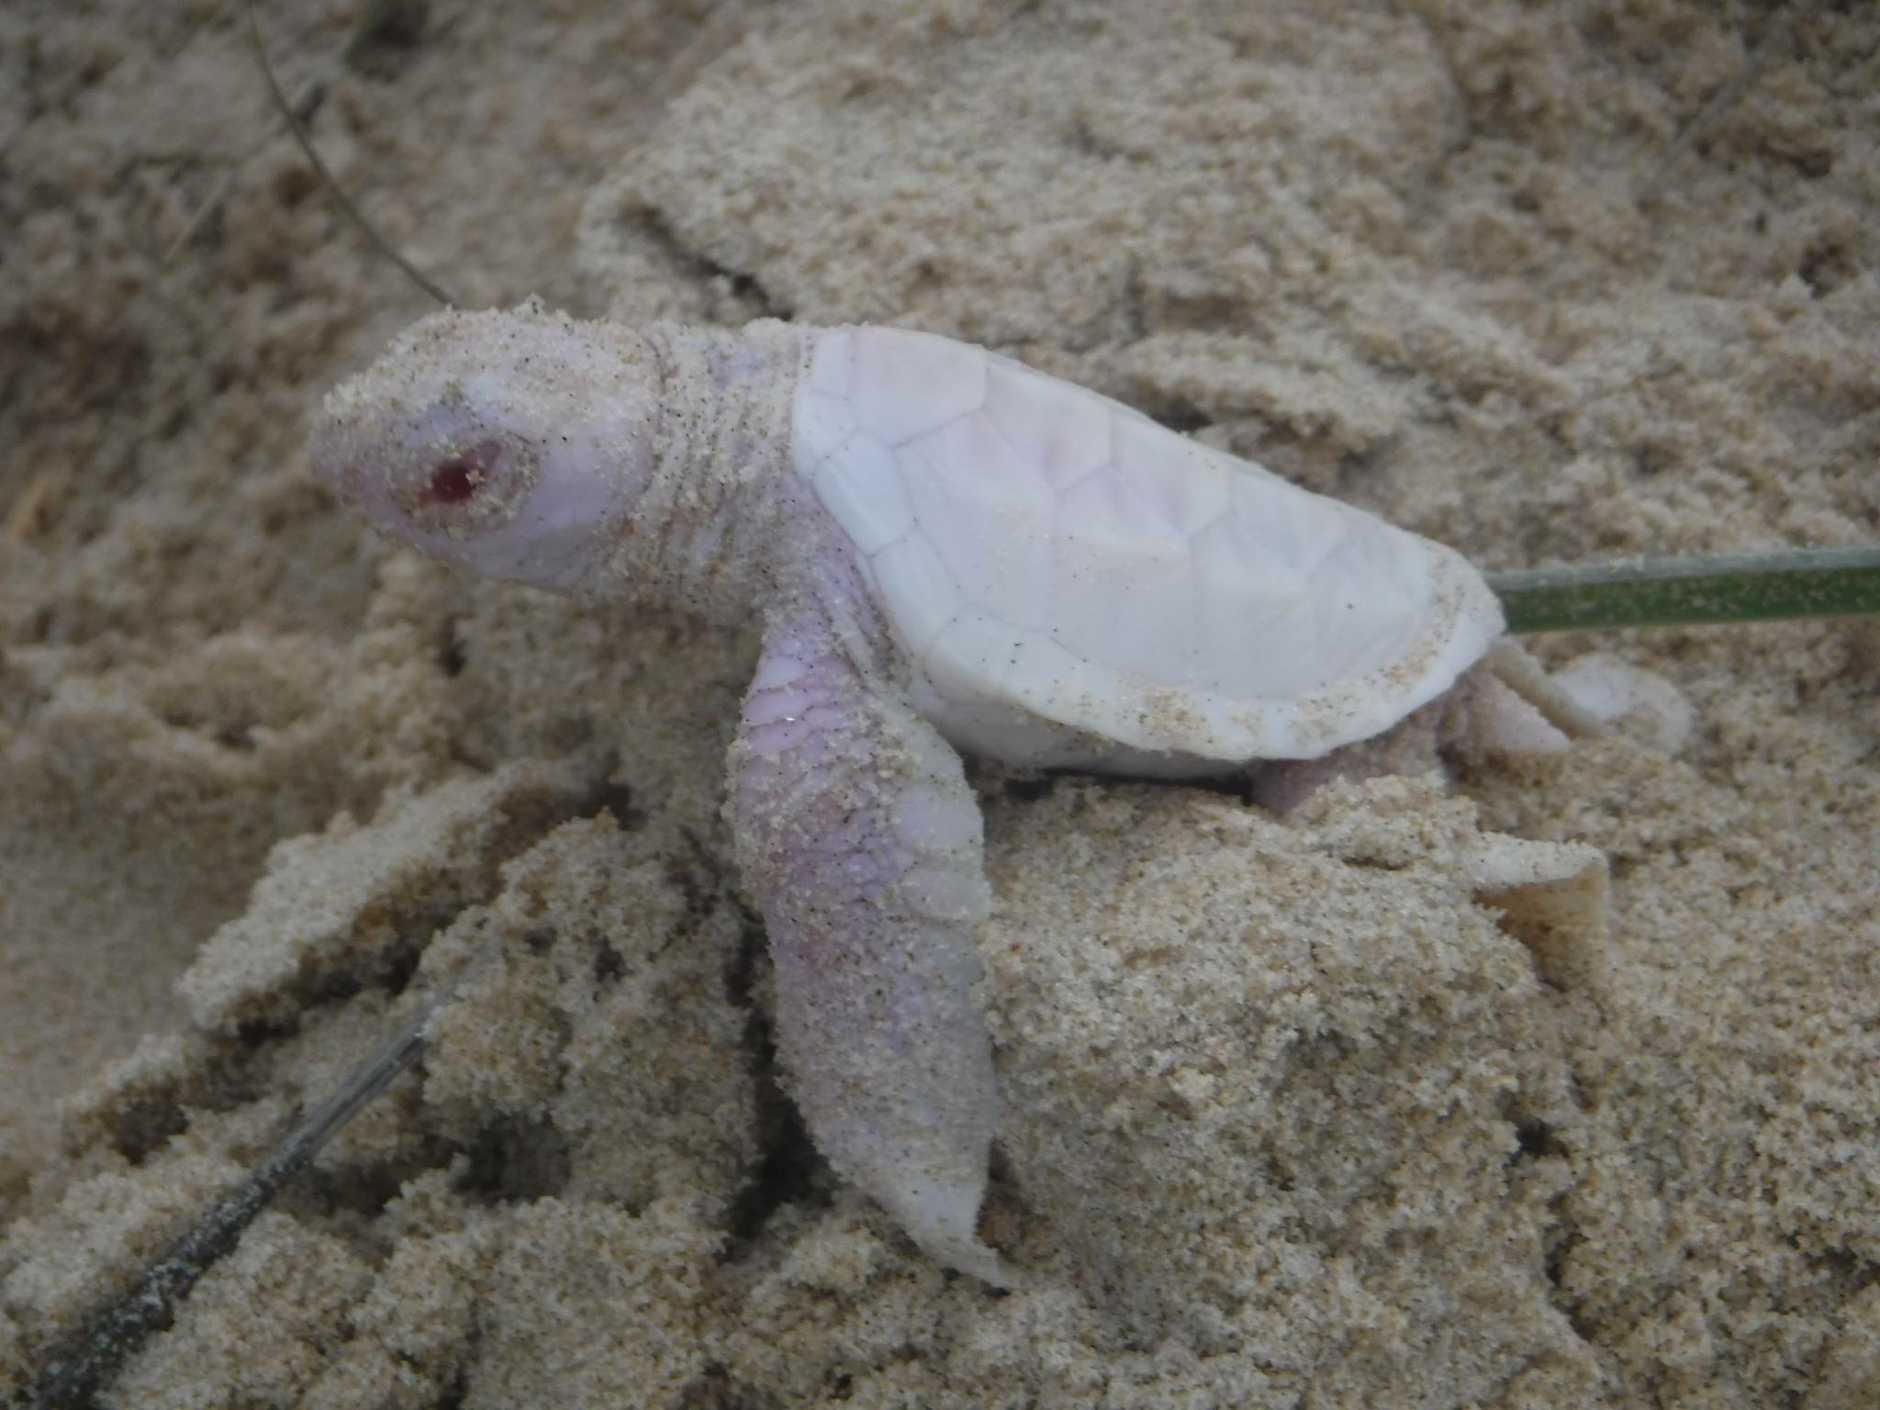 A rare albino turtle found on the Sunshine Coast. Photo: Adrienne Savage via Facebook